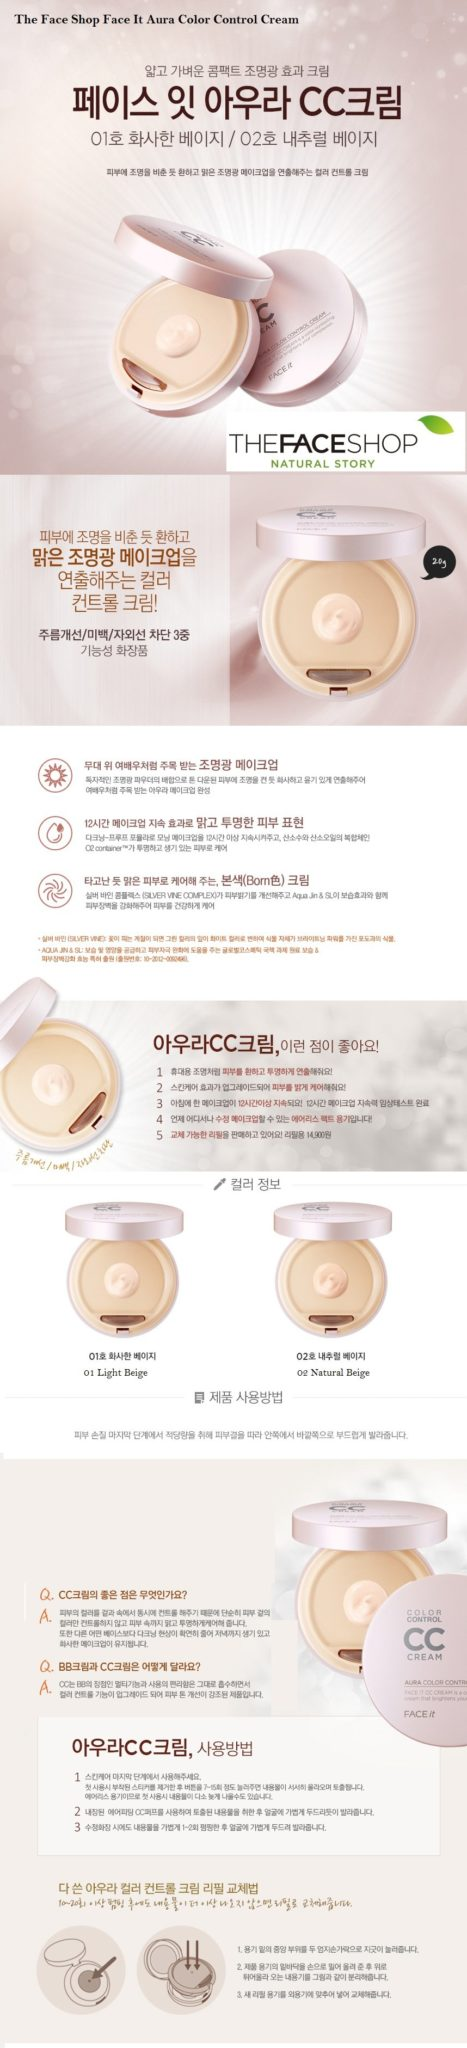 The Face Shop Face It Aura Color Control Cream 20g